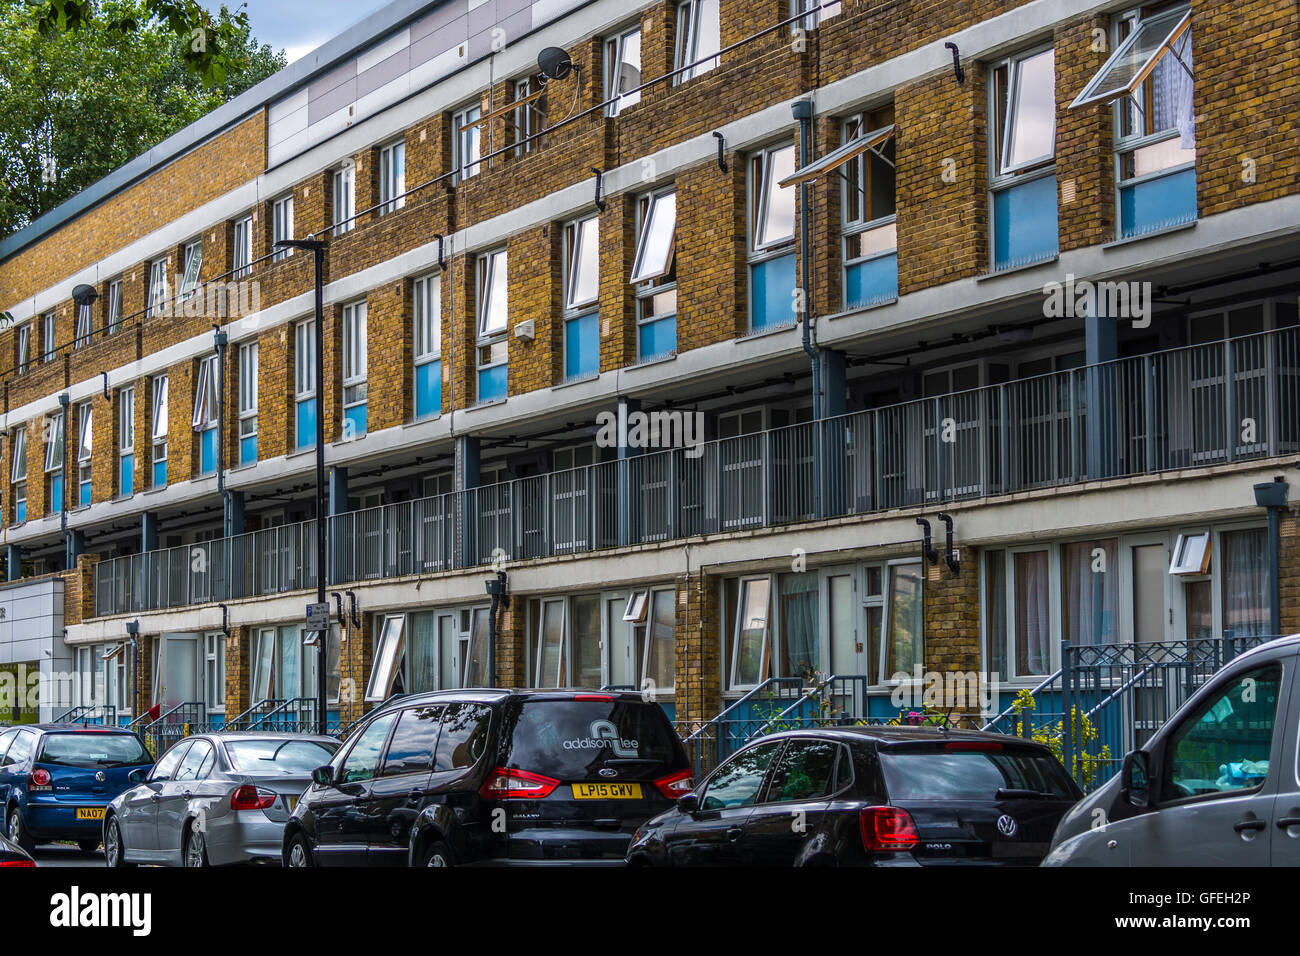 Stockwell Park Road post-war 1960s modernist flats - Stock Image